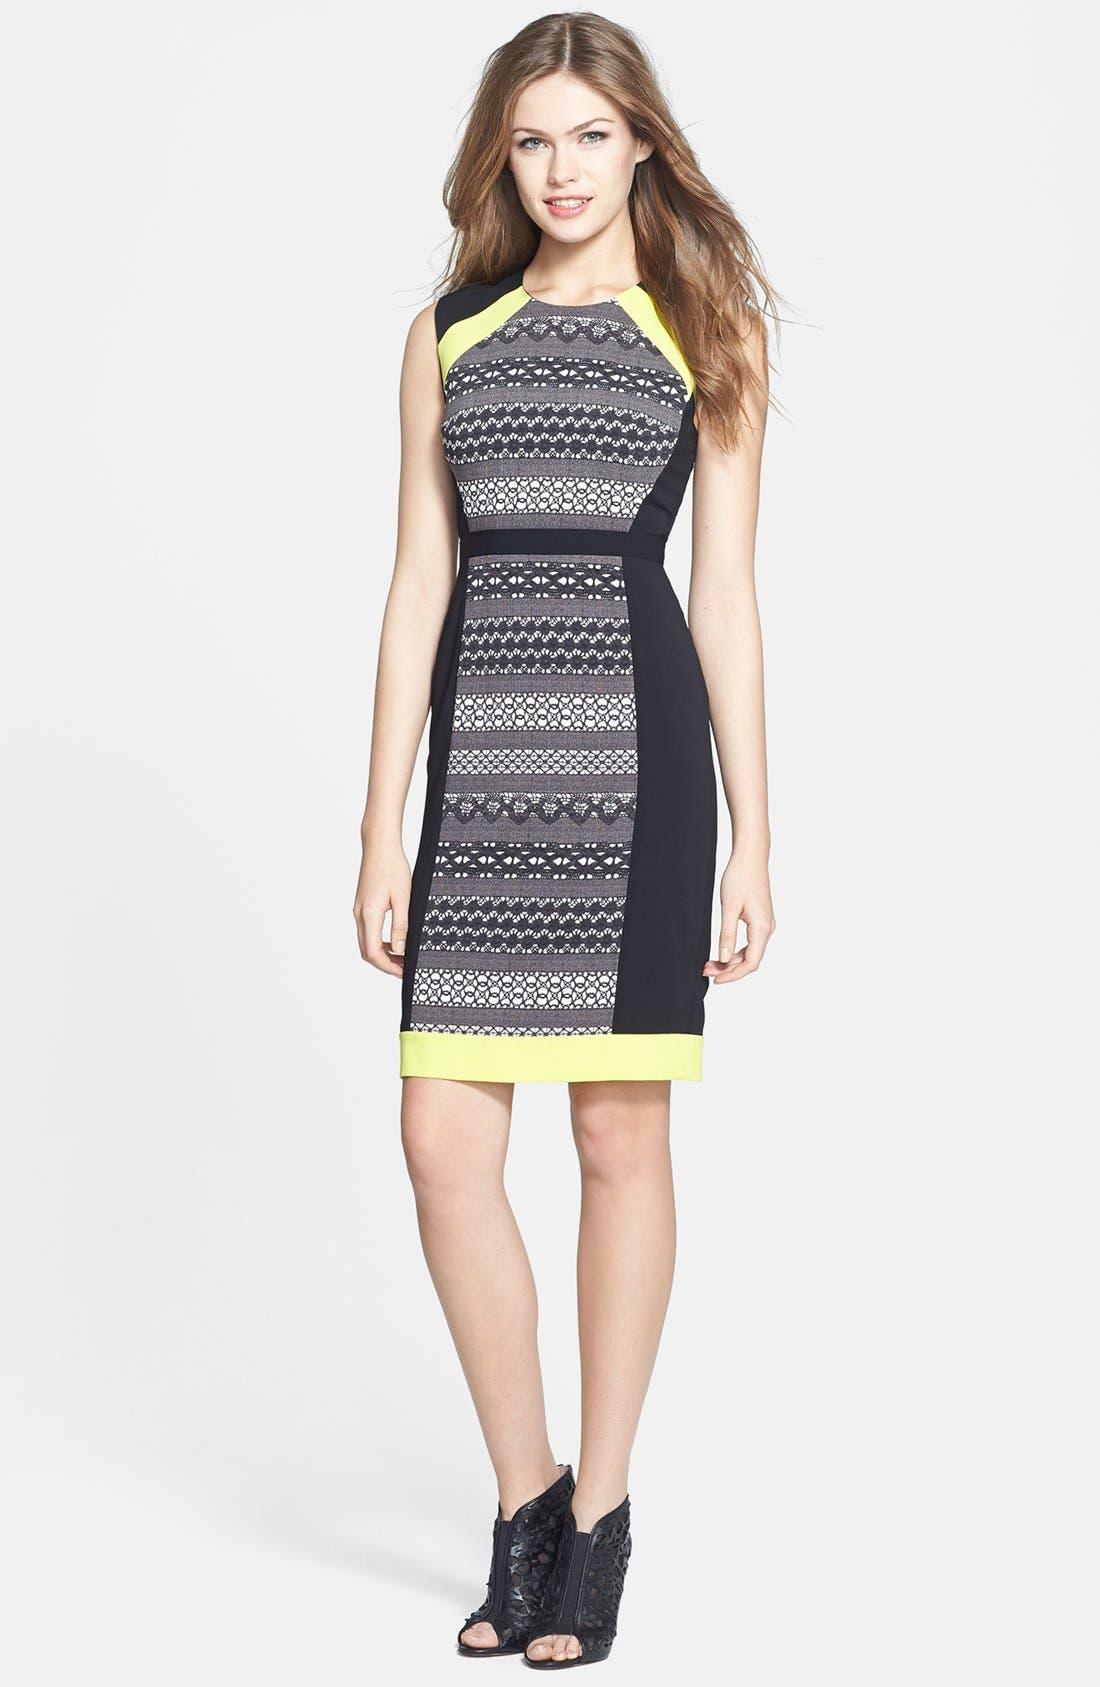 Main Image - BCBGMAXAZRIA 'Eileen' Stretch Crepe Sheath Dress